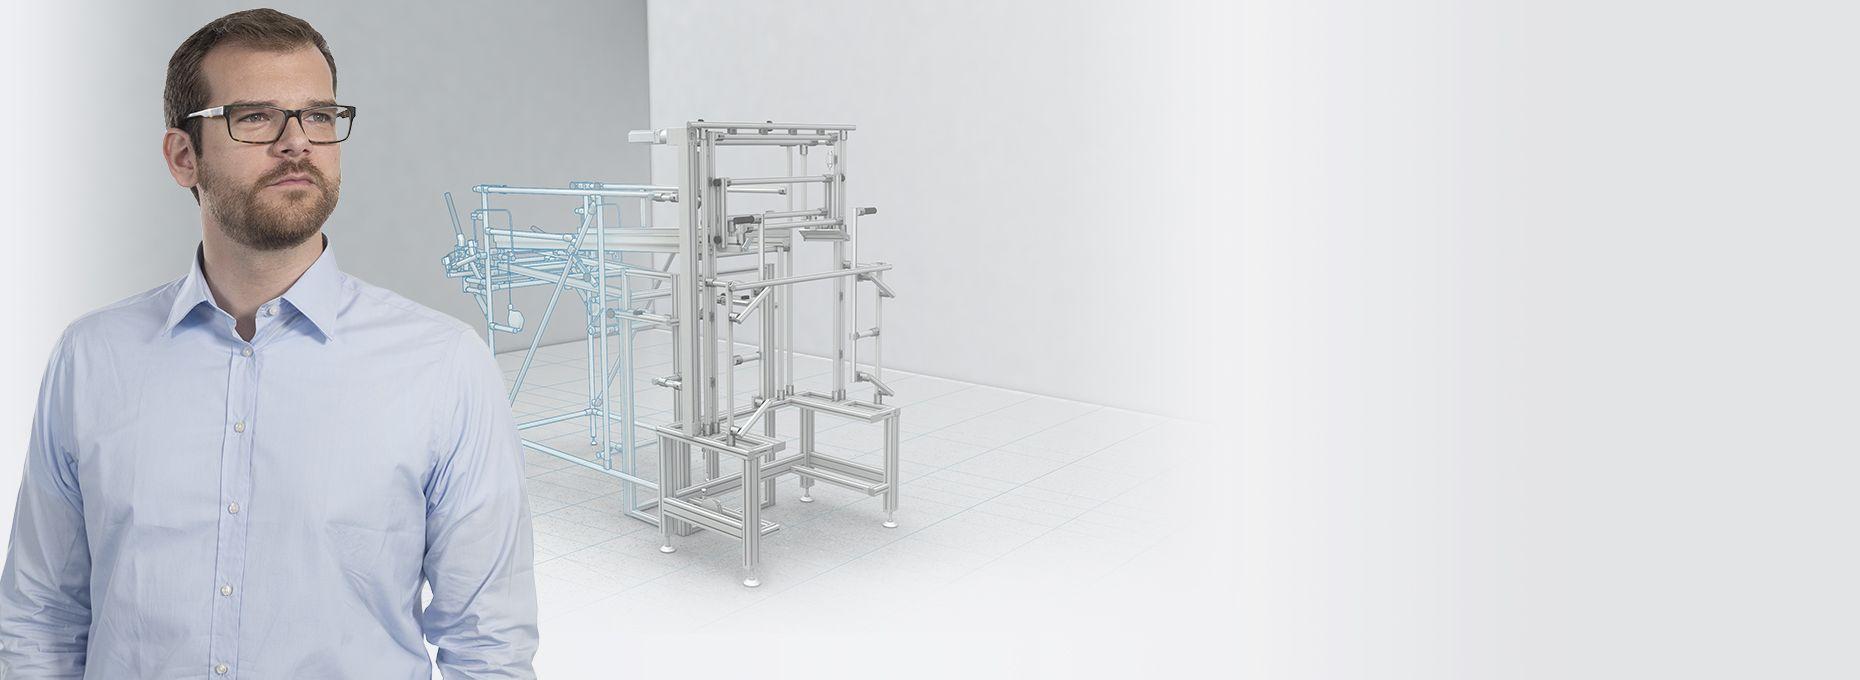 item – aluminum profiles, linear technology, work bench system